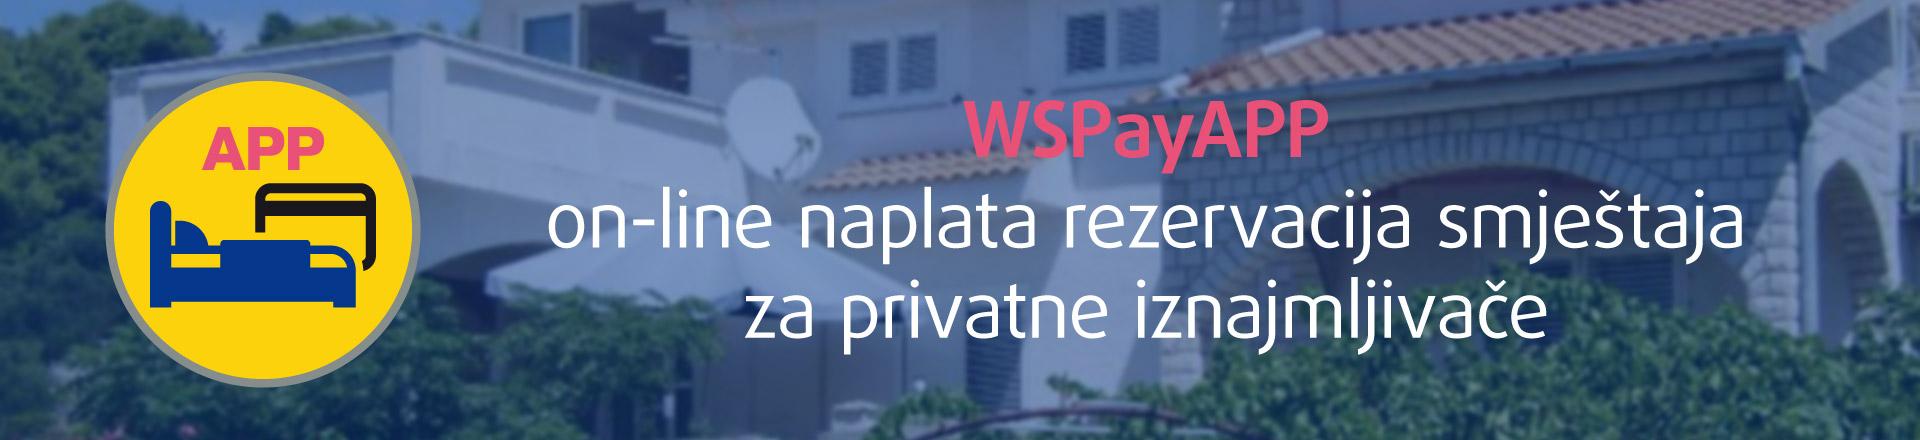 https://www.wspay.rs/Repository/Banners/WSPayAPP-1920x440.jpg